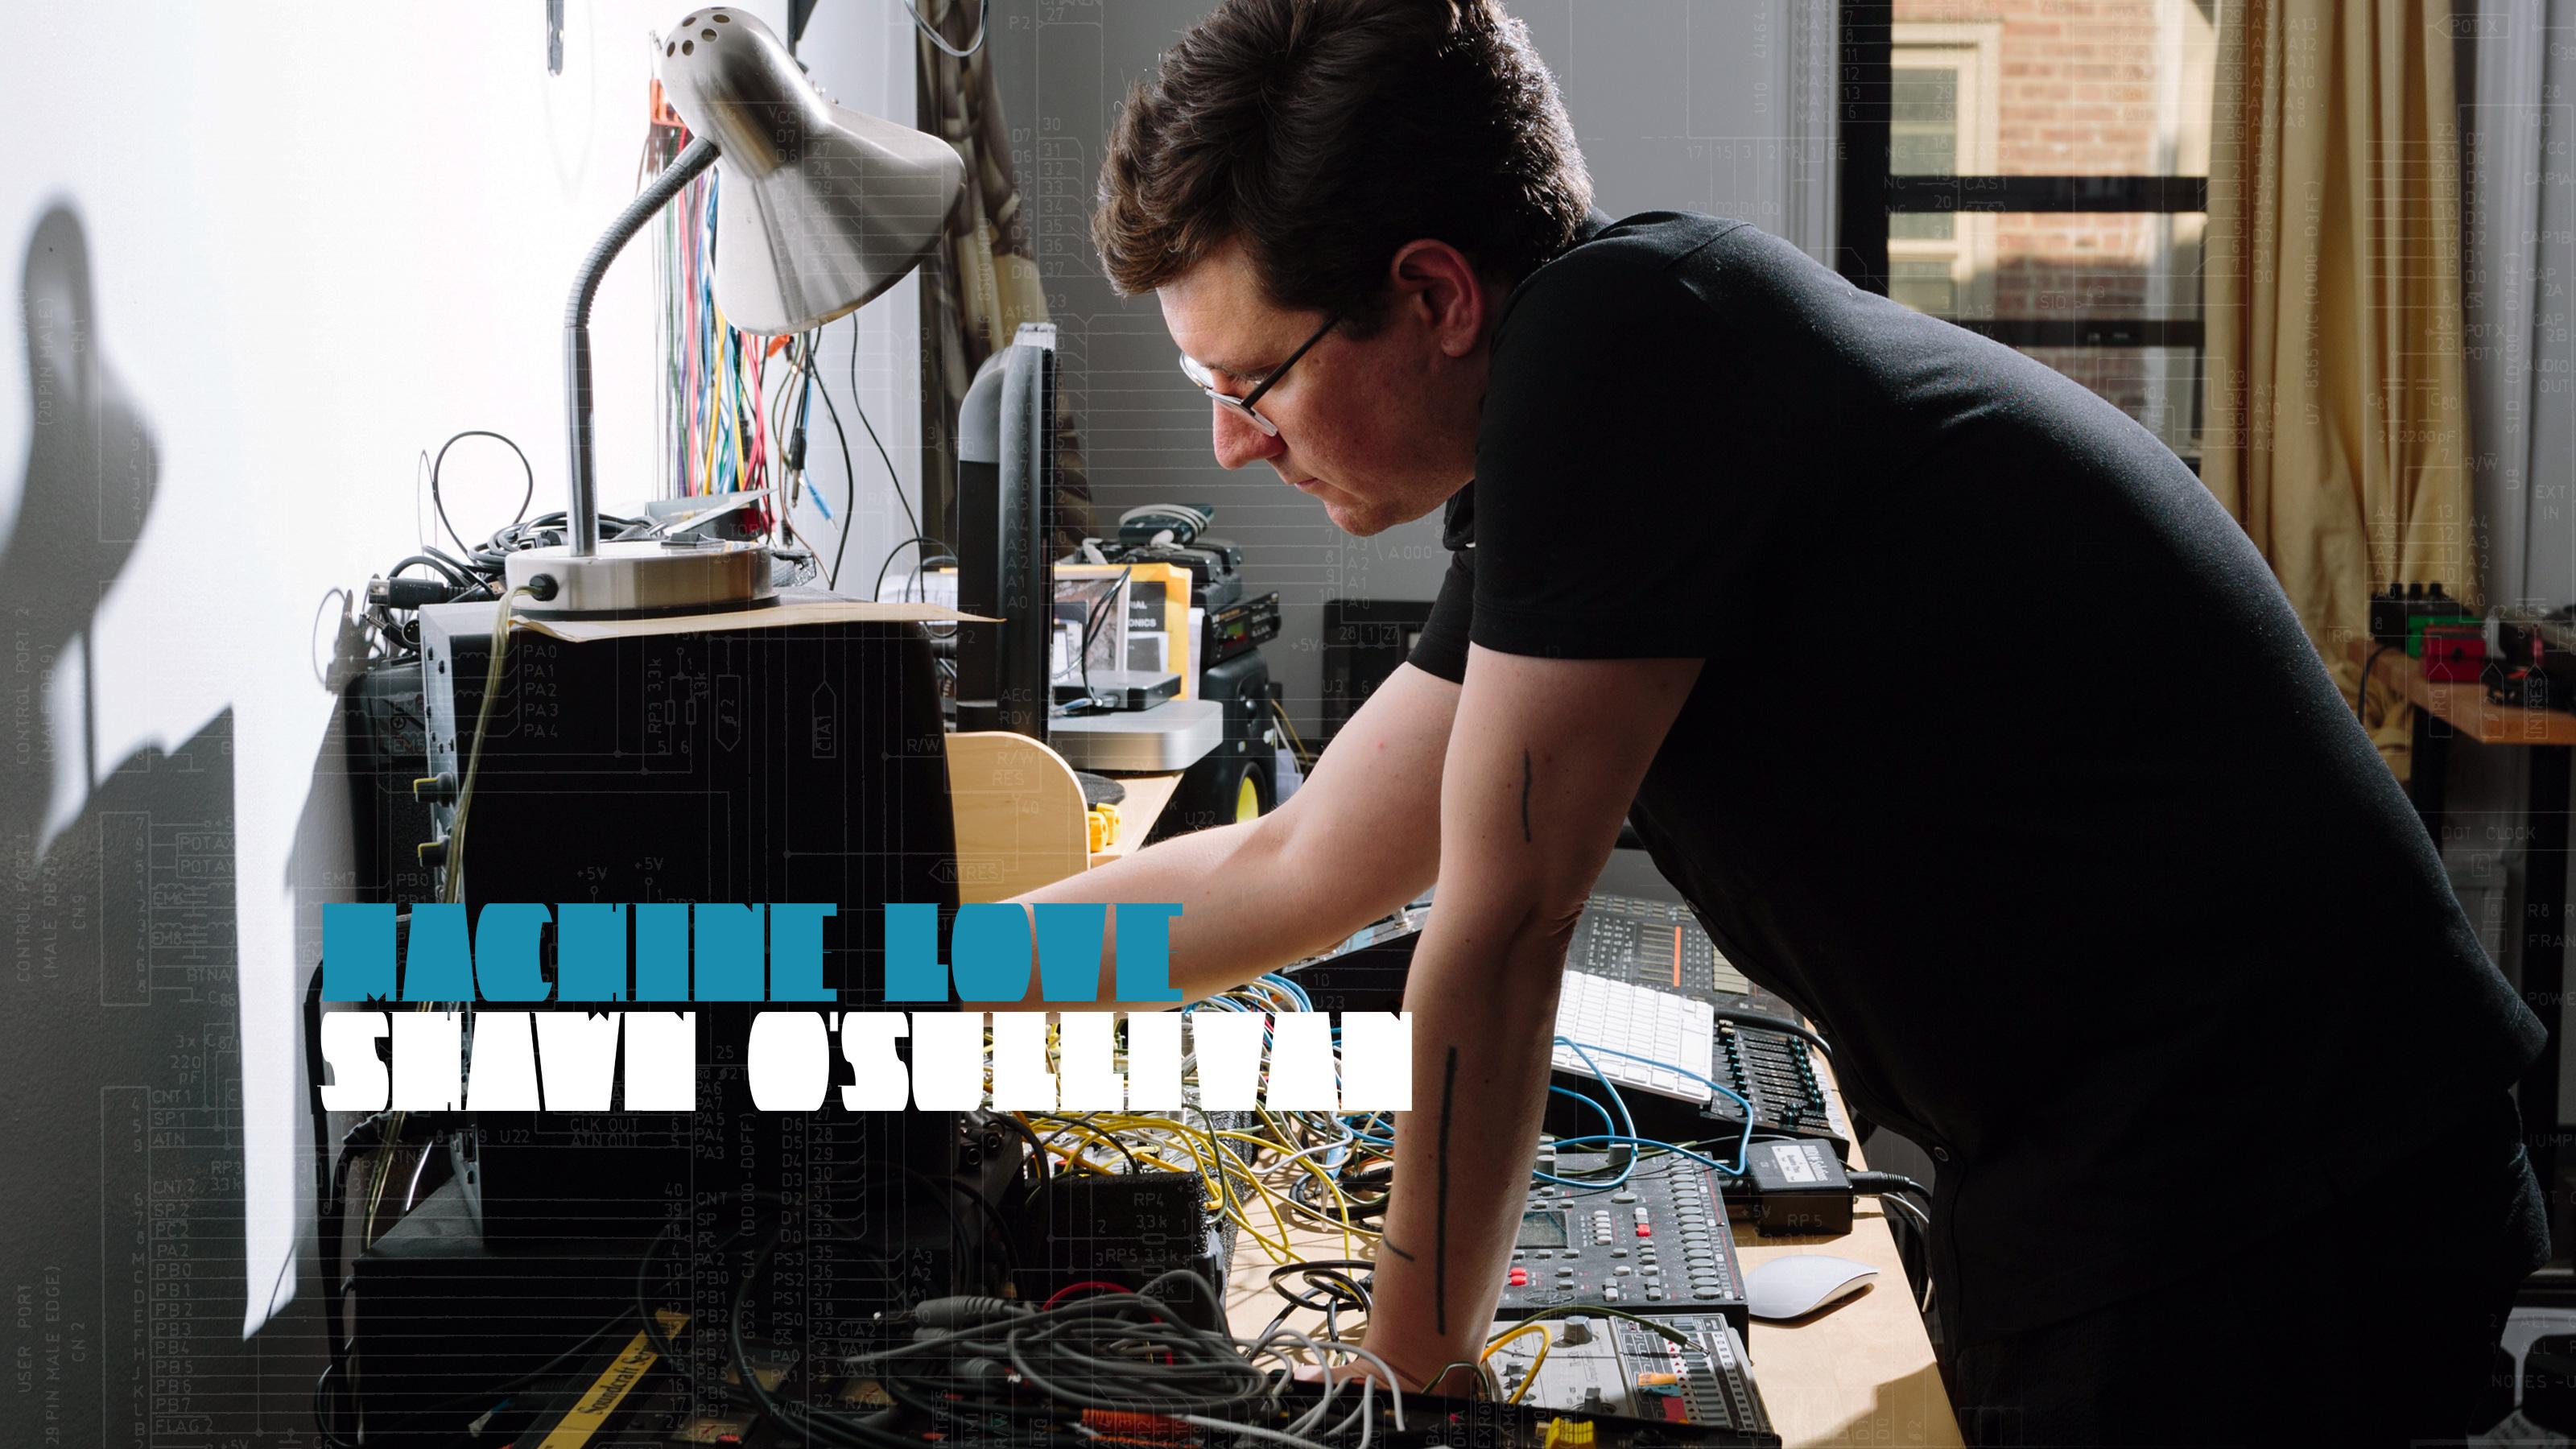 Machine Love: Shawn O'Sullivan